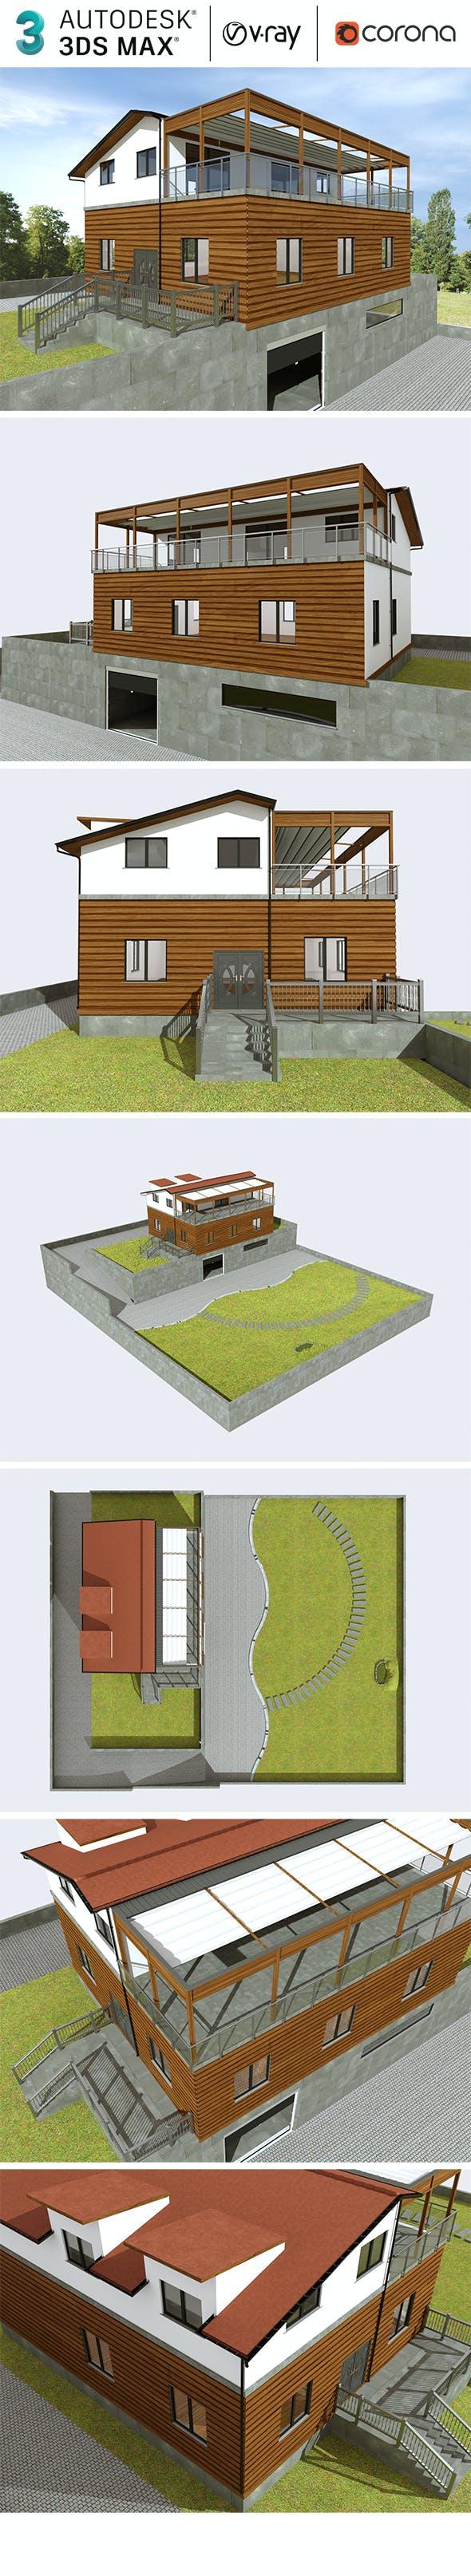 Realistic Exterior Villa Design - 3DOcean Item for Sale